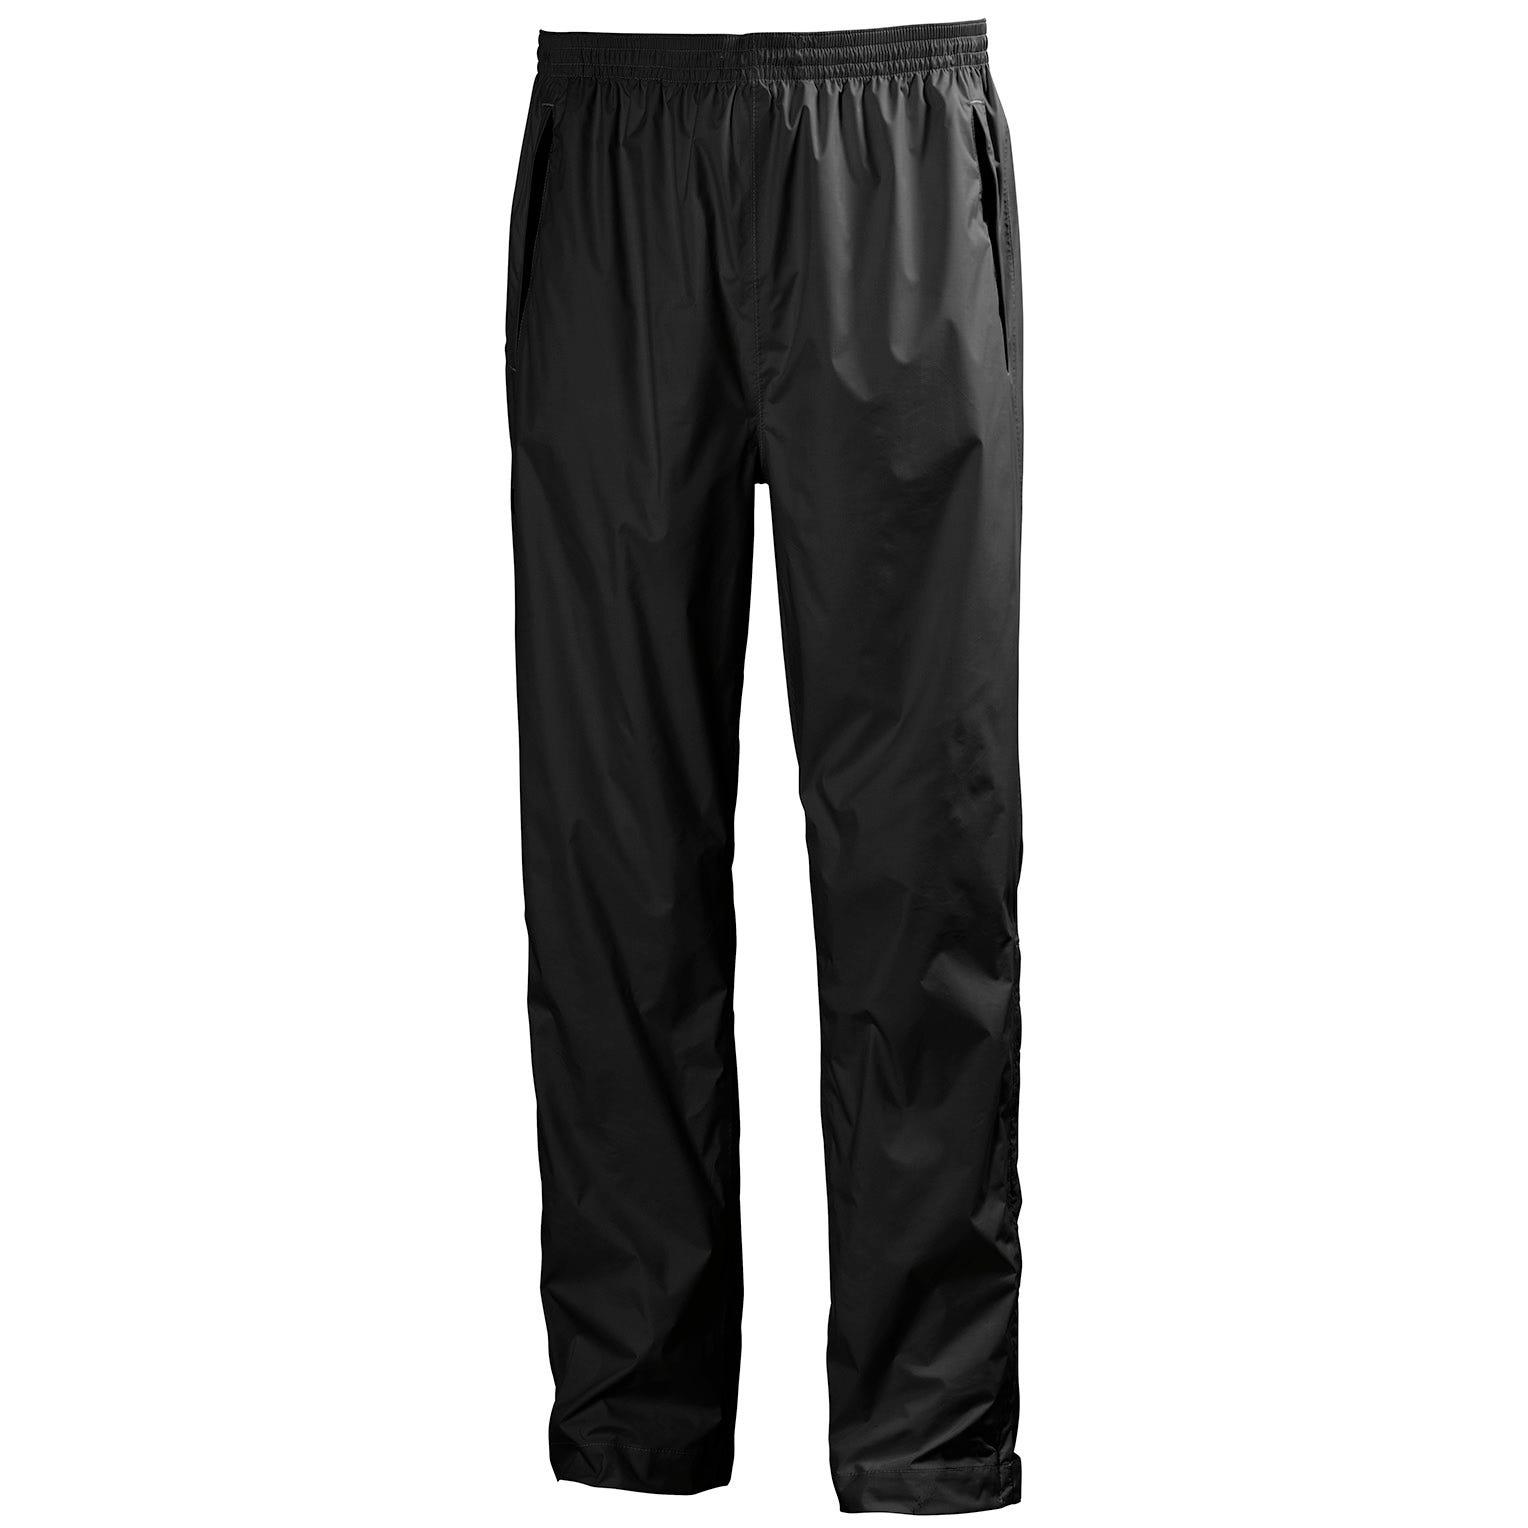 Helly Hansen Loke Pants Mens Hiking Pant Black M